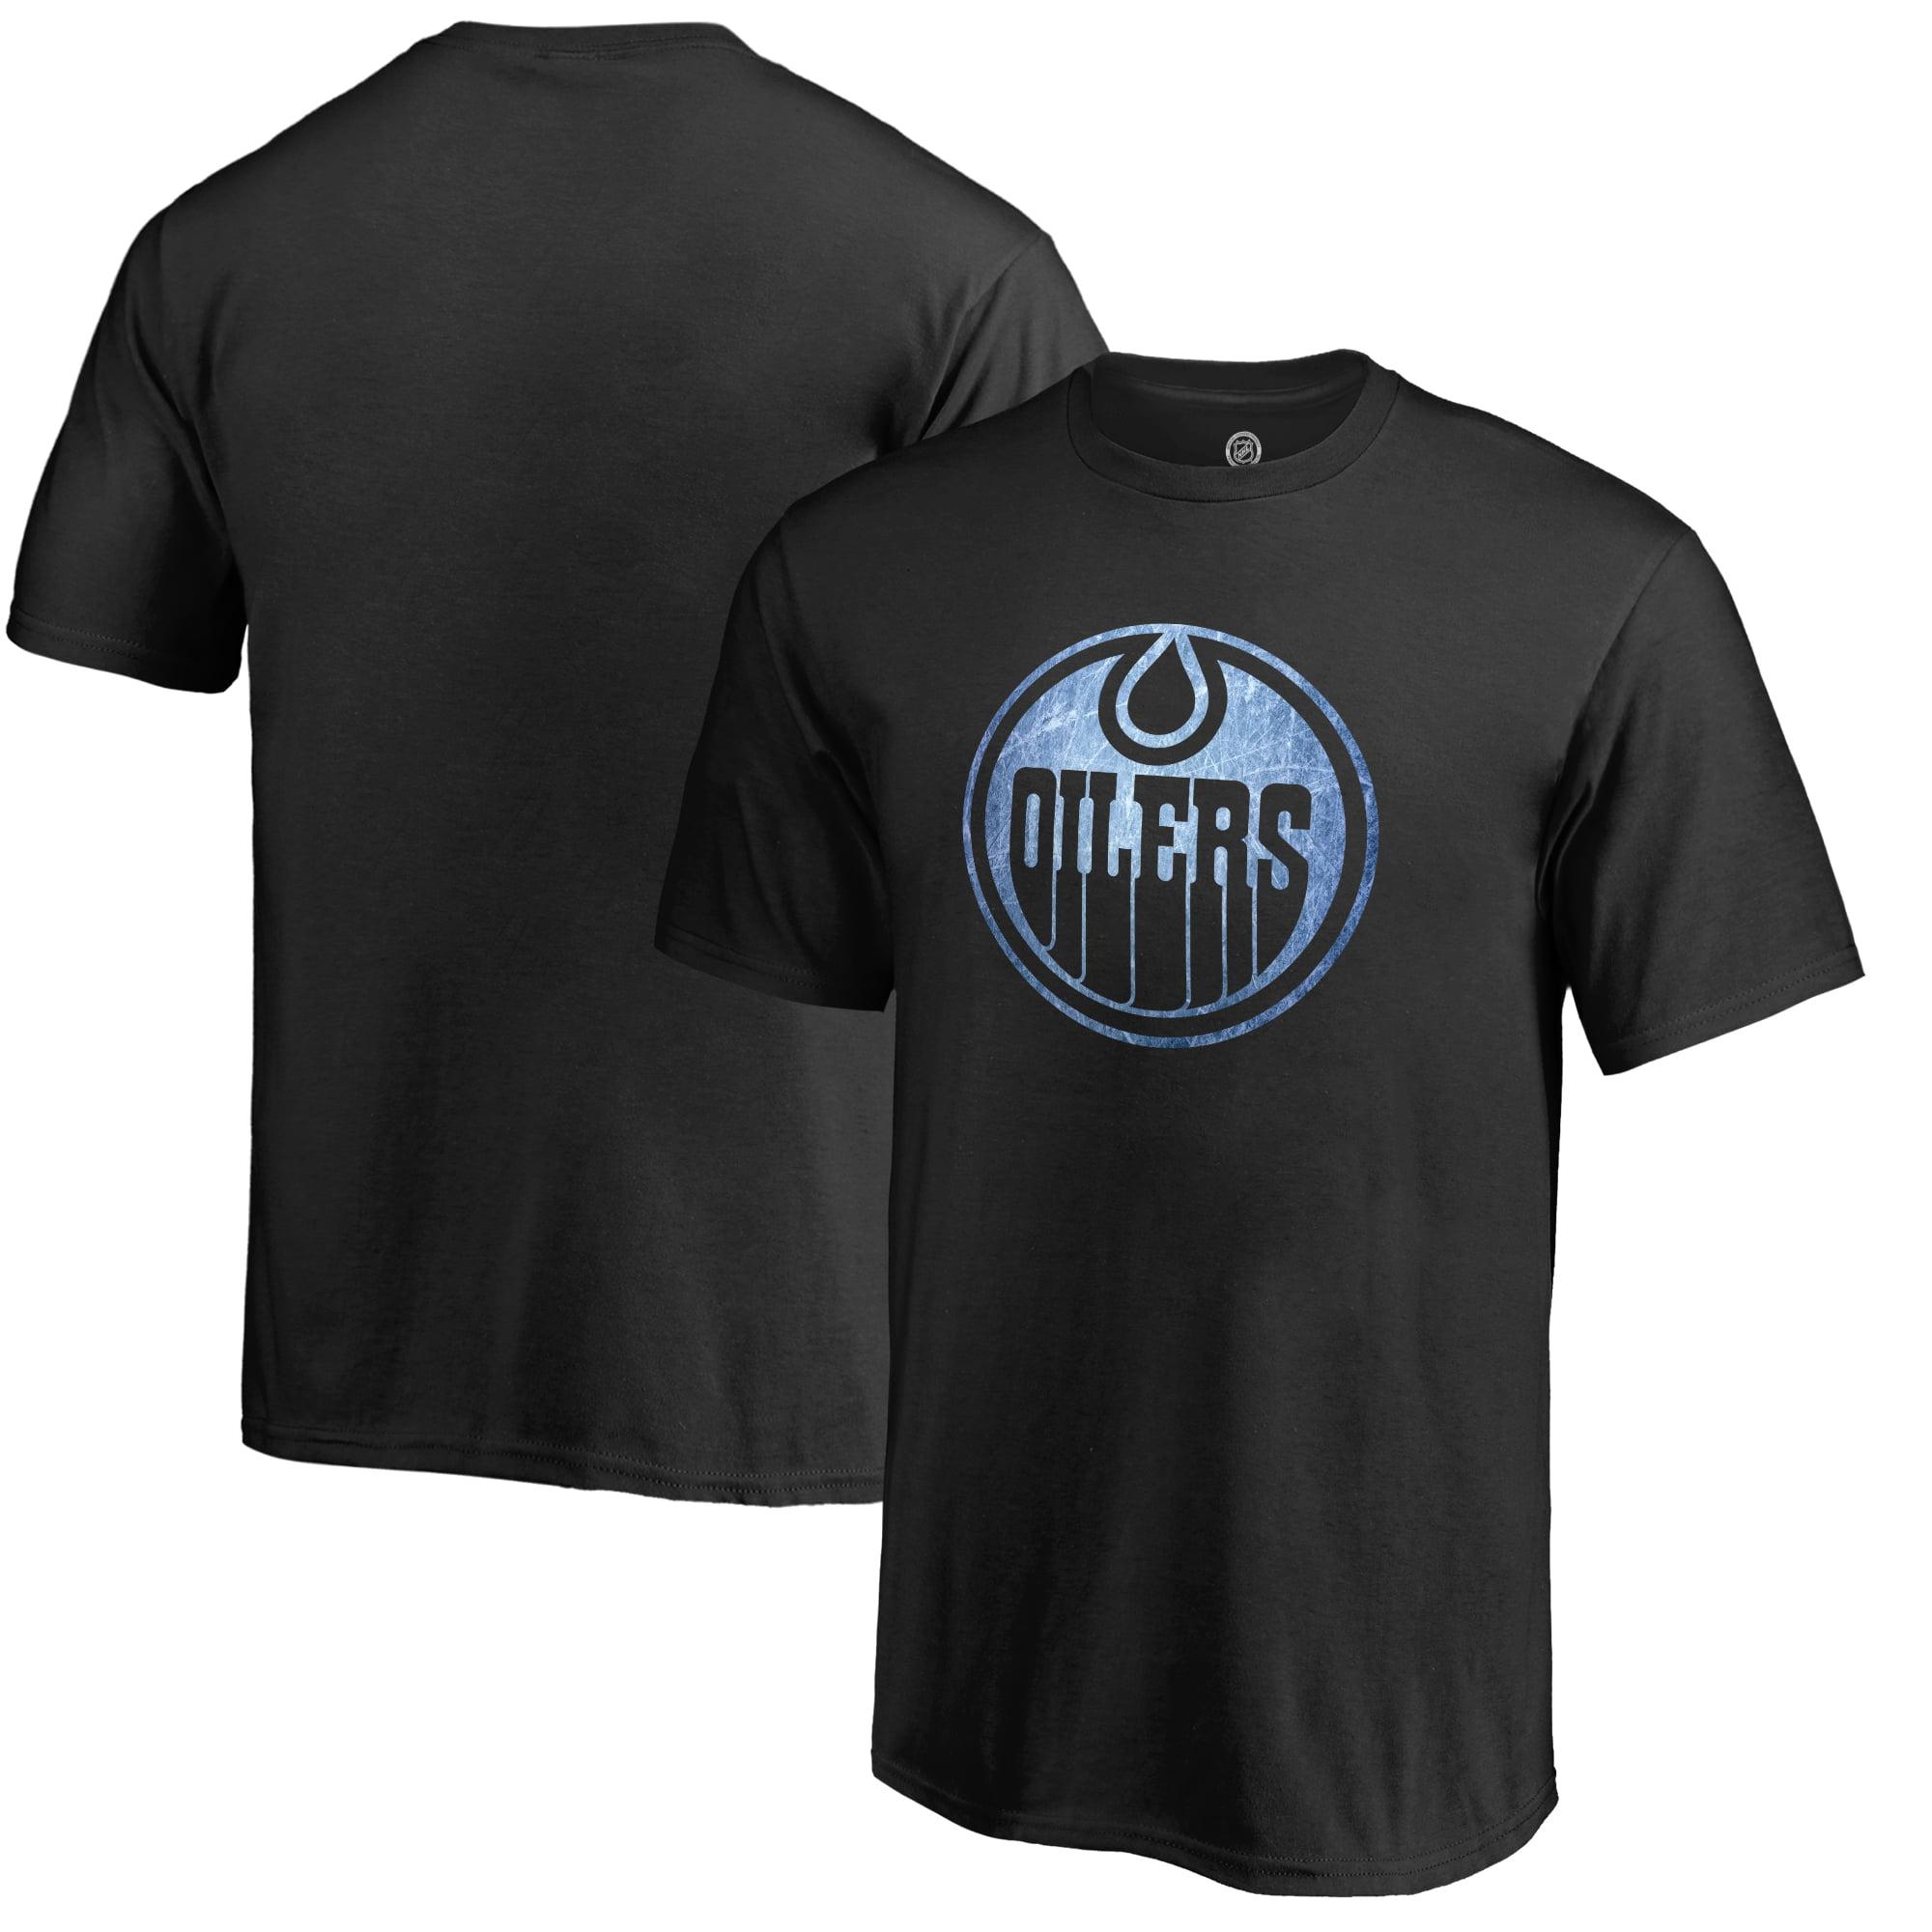 Edmonton Oilers Youth Pond Hockey T-Shirt Black by Football Fanatics/Ruppshirts